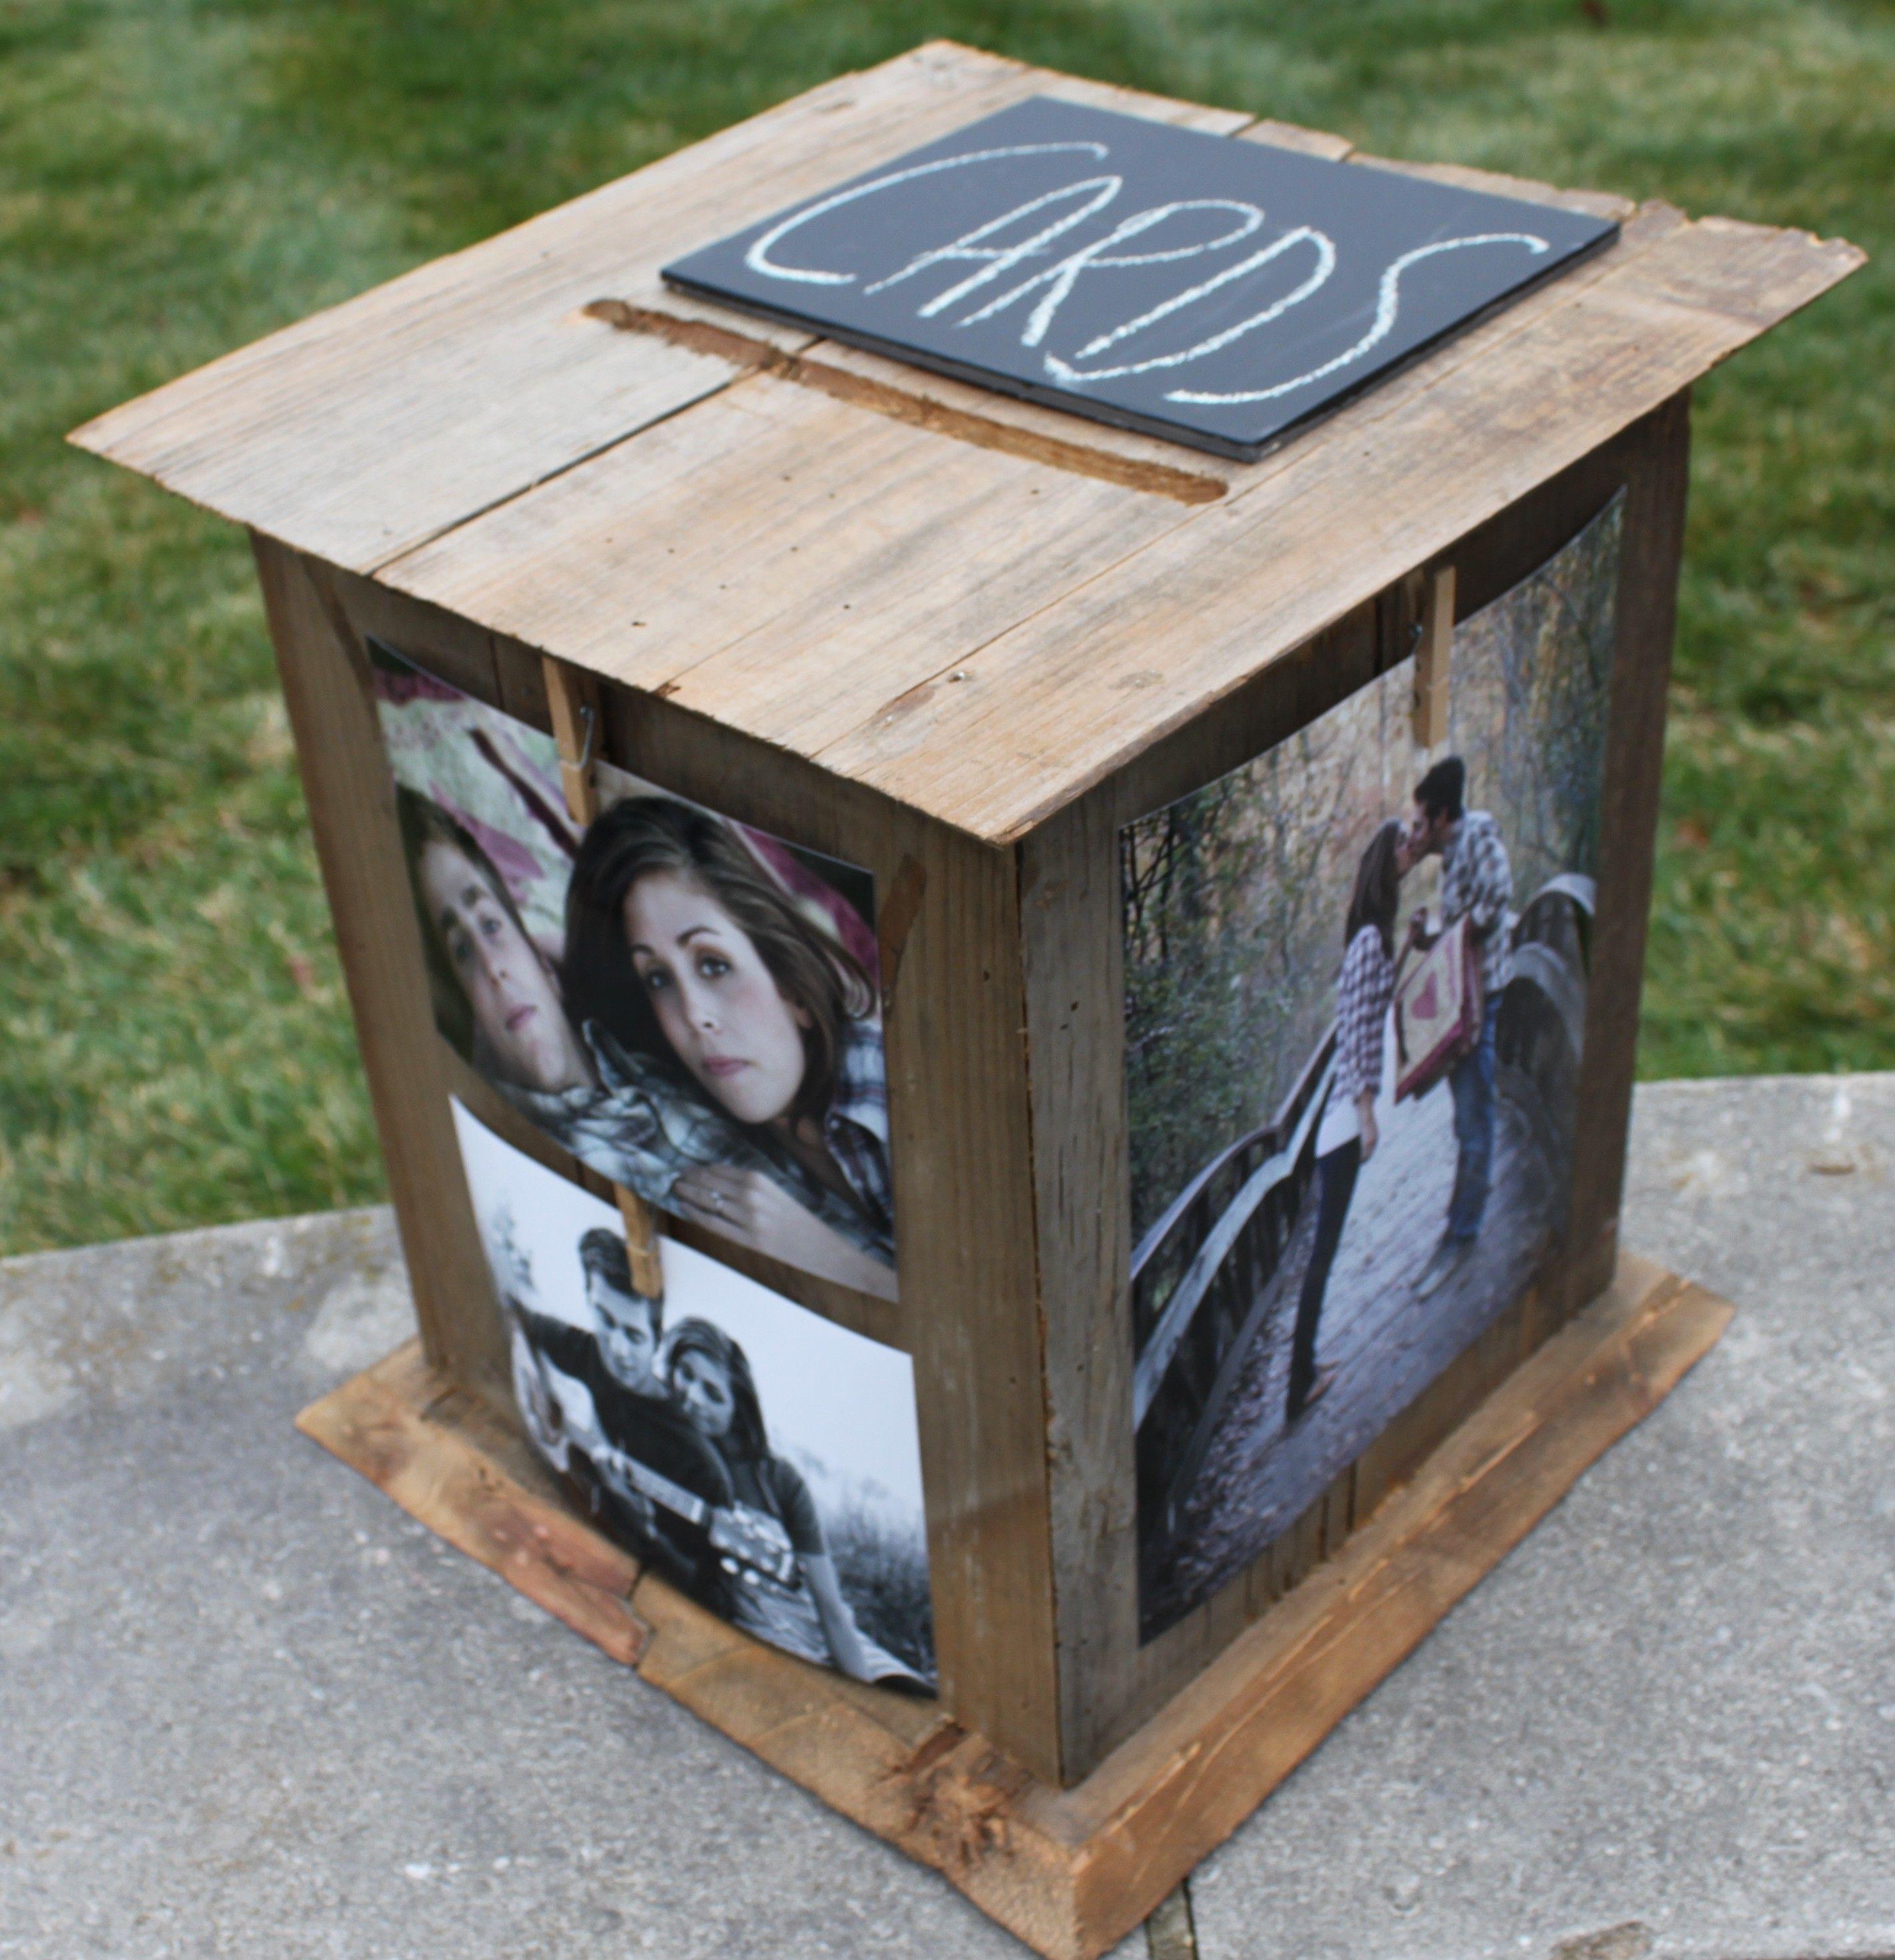 Build A Diy Card Box Building Plans By Buildbasic Www Build Basic Com Card Box Wedding Wedding Card Box Ideas Elegant Card Box Wedding Diy